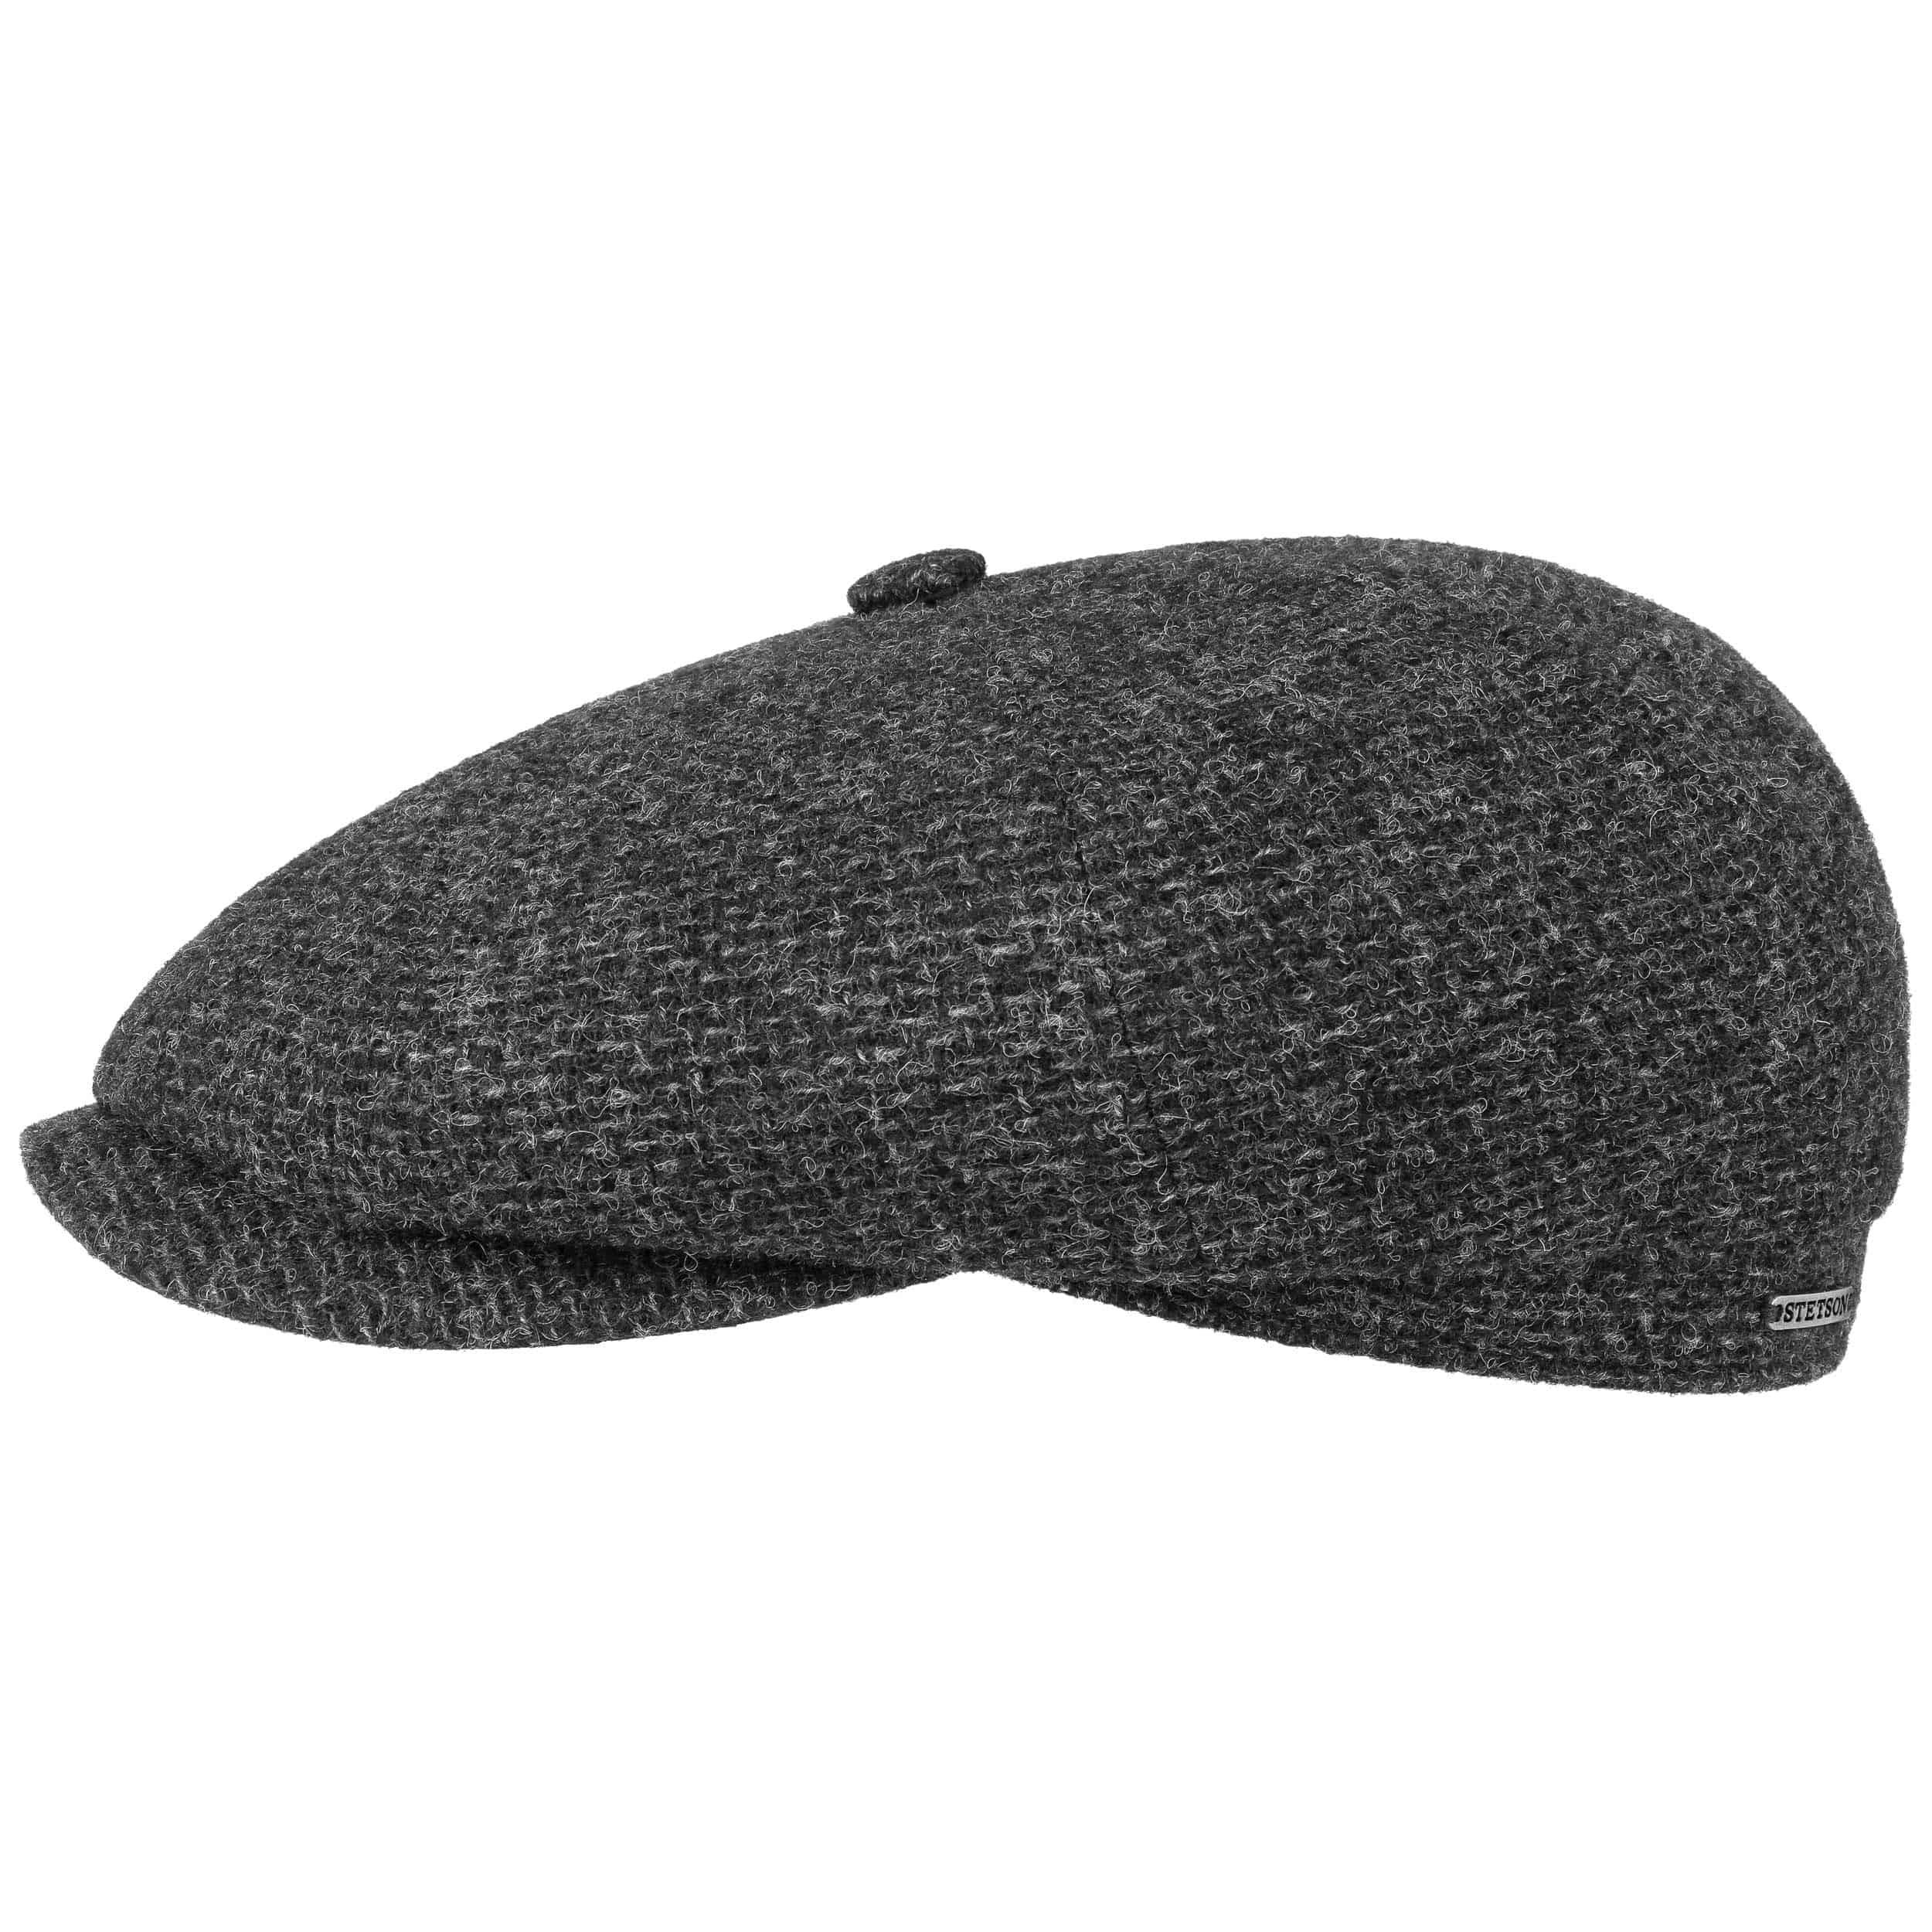 Gorra Hatteras Shetland Wool by Stetson - Gorras - sombreroshop.es 7b87eed496f